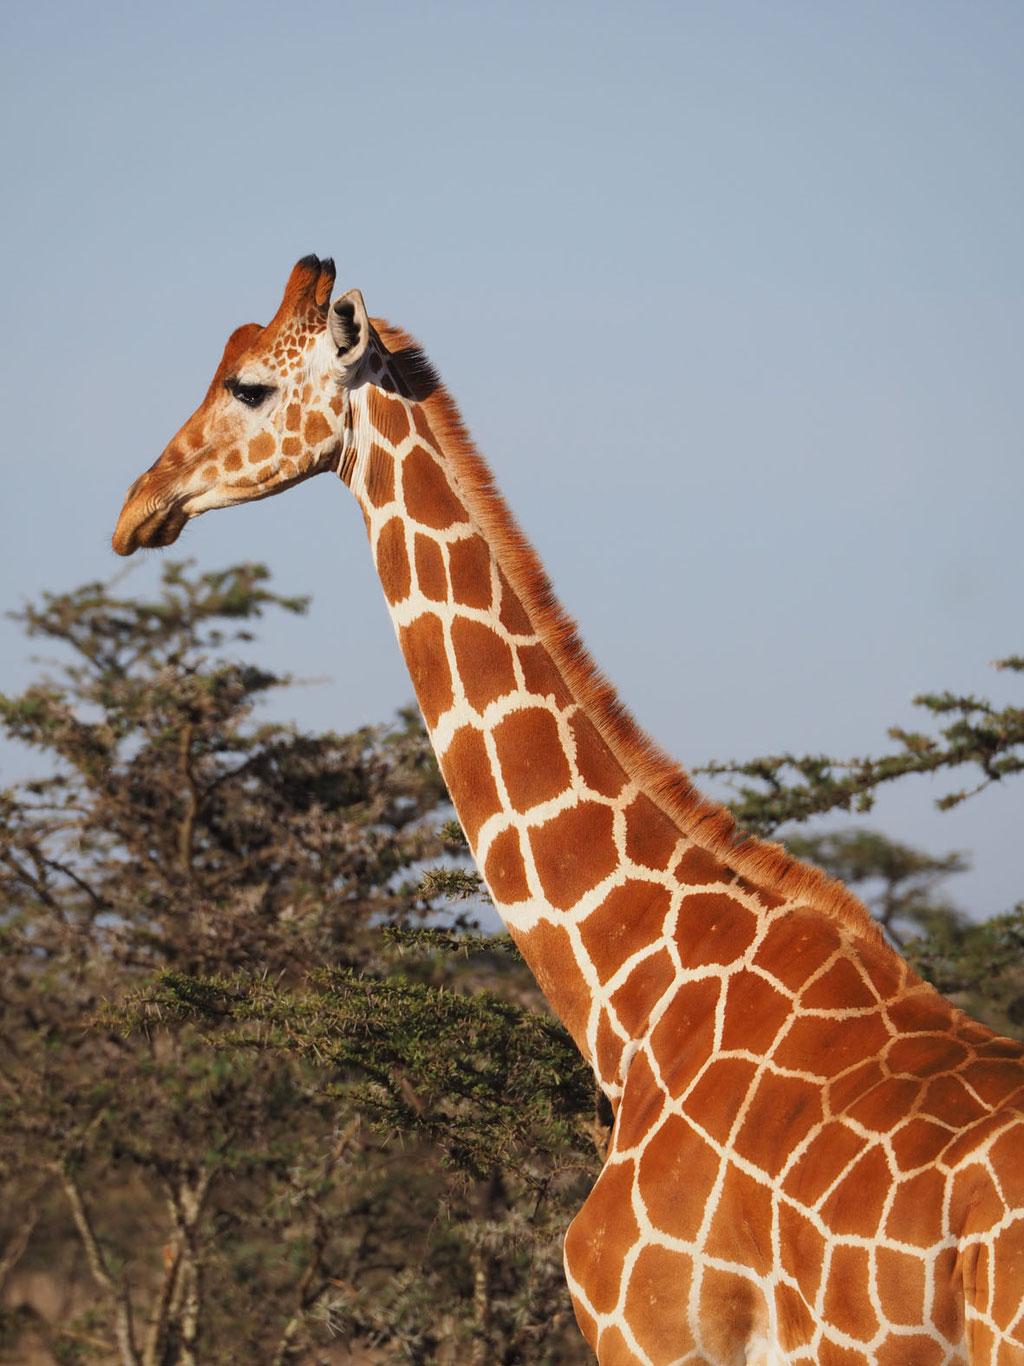 Kenia, Laikipia Plateau: Netzgiraffe